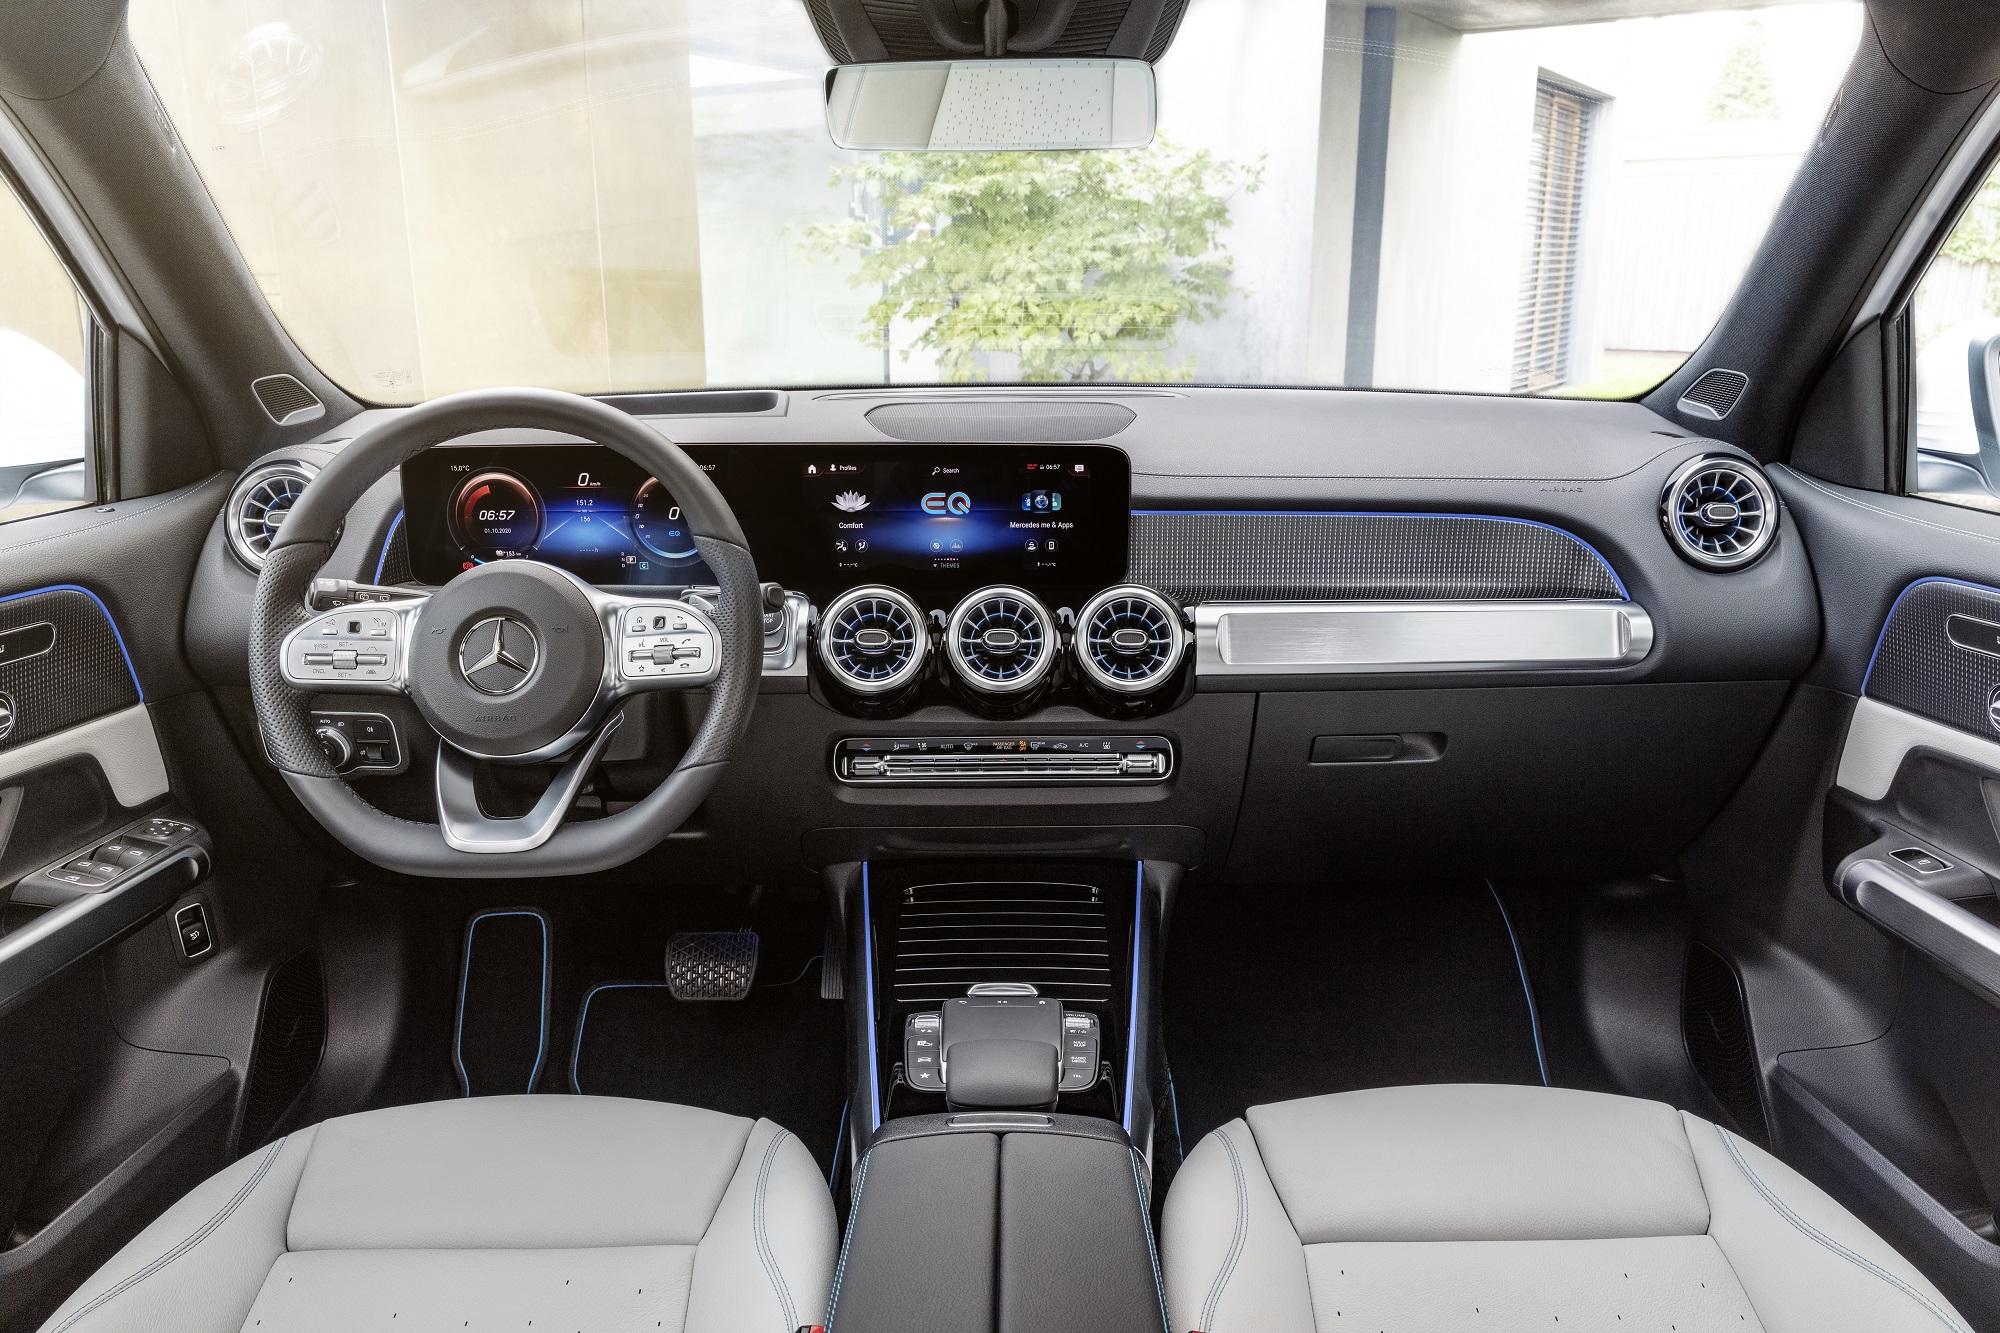 Mercedes-EQ, EQB, 2021; Edition 1, Farbe digitalweiß, Interieur: nevagrau; EQB 350 4MATIC (Stromverbrauch kombiniert: 16,2 kWh/100 km; CO2-Emissionen kombiniert: 0 g/km) // Mercedes-EQ, EQB, 2021; Edition 1, digital white, interior: neva grey; EQB 350 (combined power consumption: 16.2 kWh/100 km, combined CO2 emissions: 0 g/km)